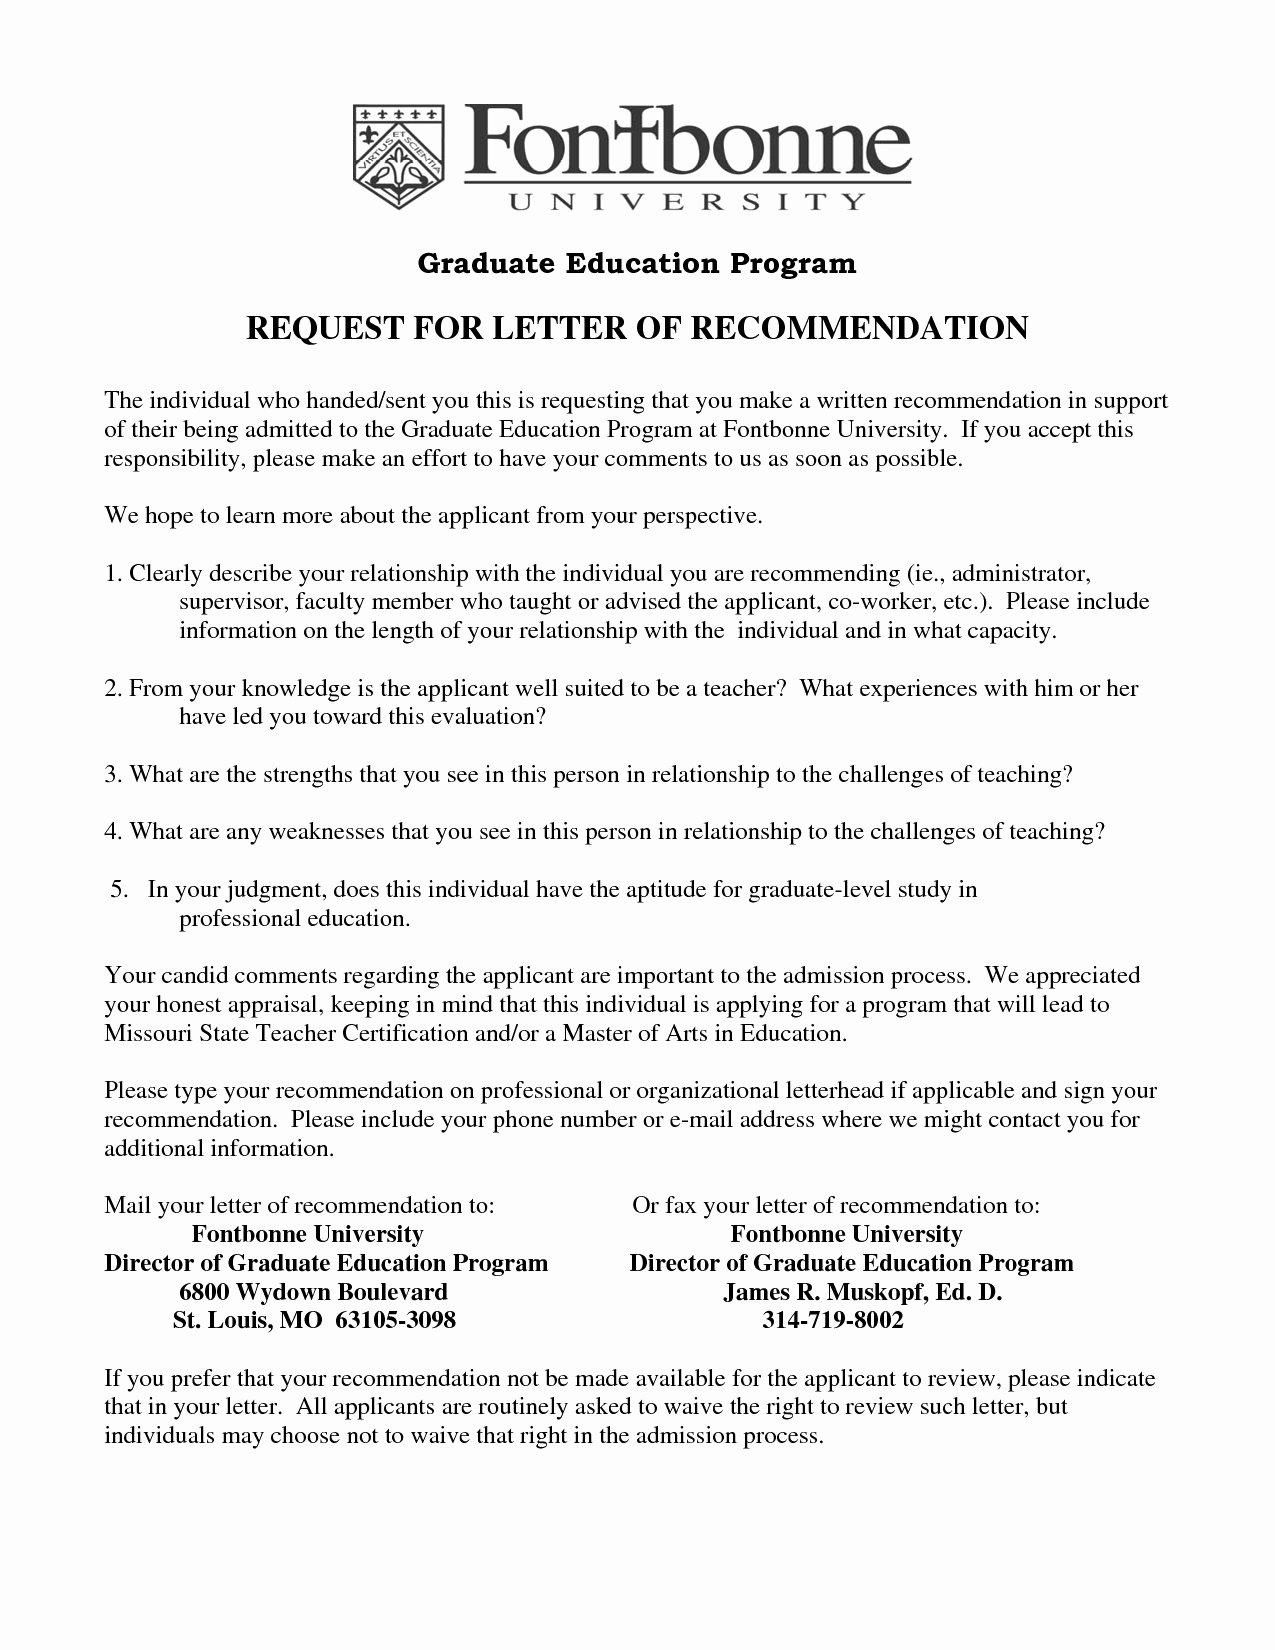 Sample Recommendation Letter for Coworker Beautiful Letter Re Mendation Template for Coworker Examples